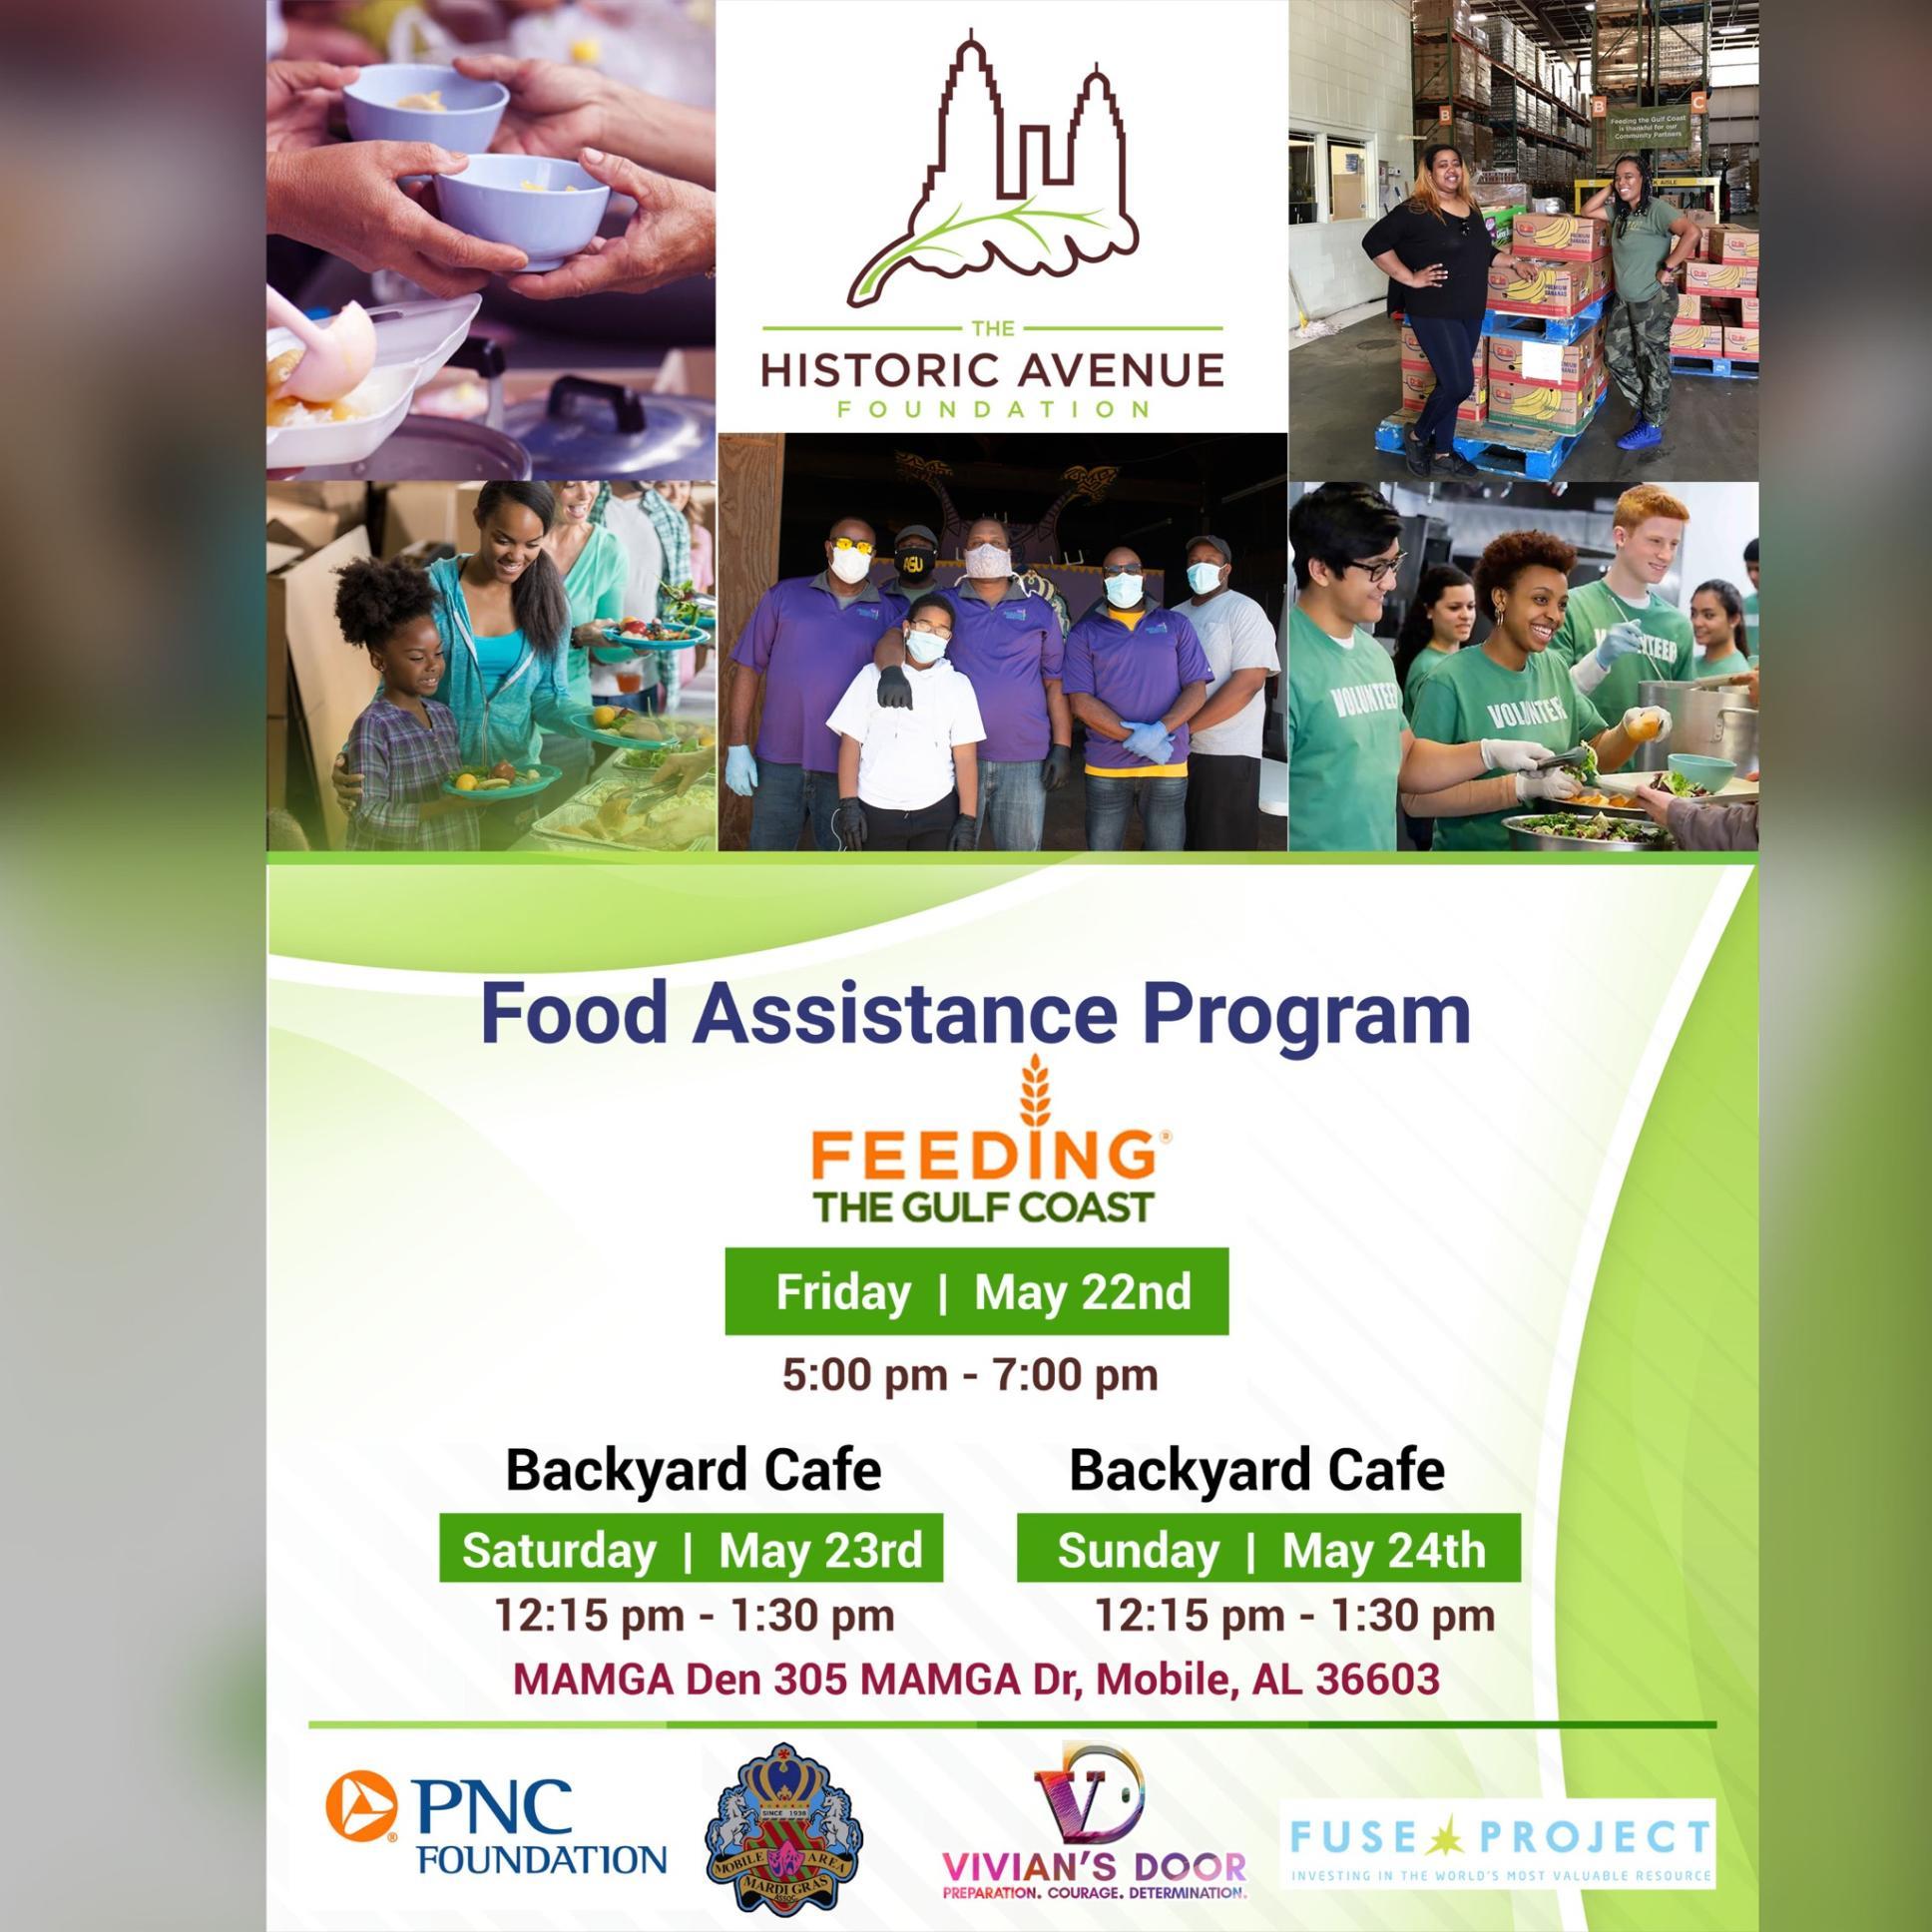 Historic Avenue Foundation - Food Assistance Program